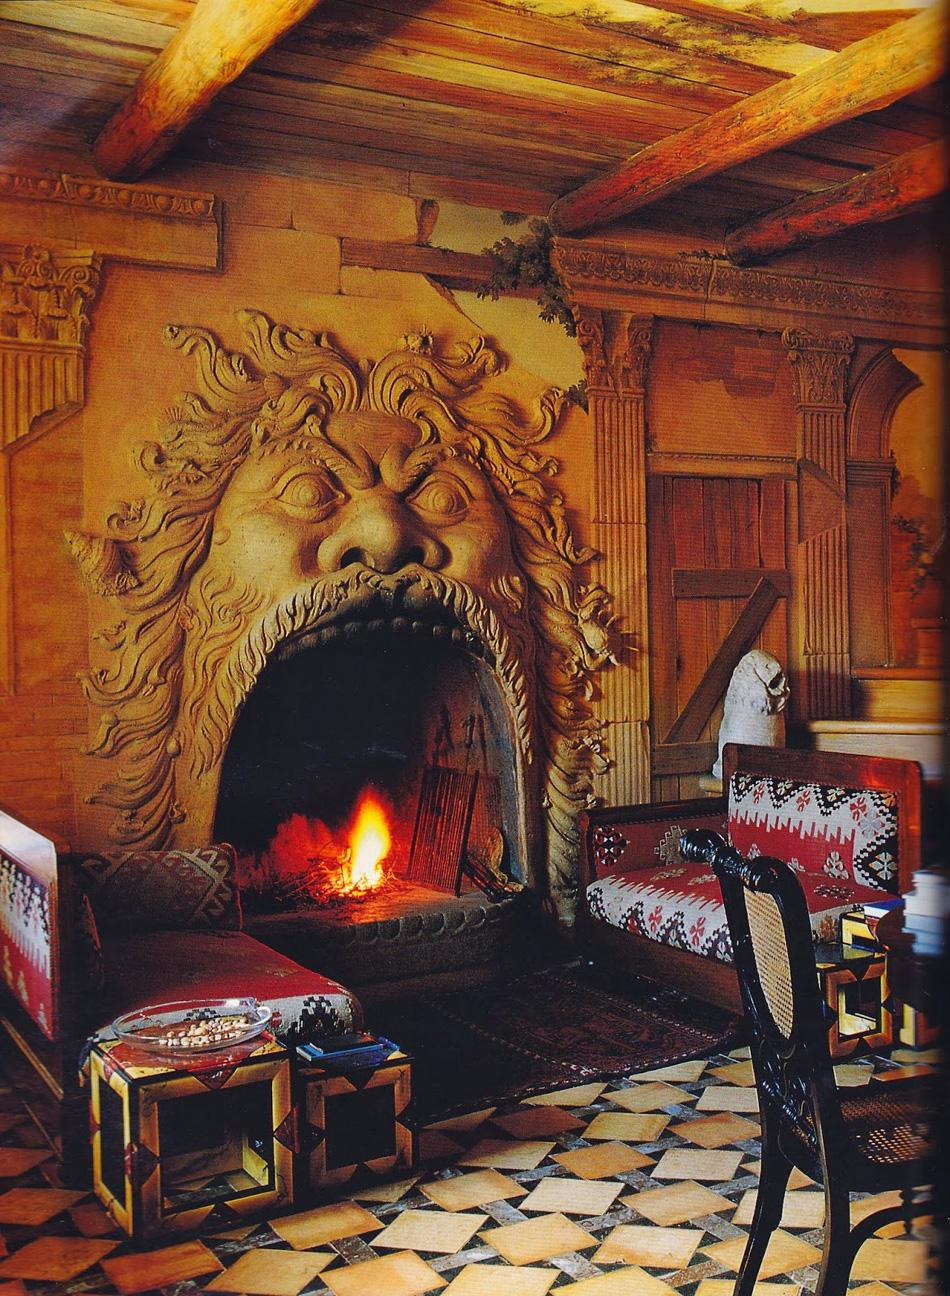 Country House Fireplace Tuscany Italy Photo On Sunsurfer